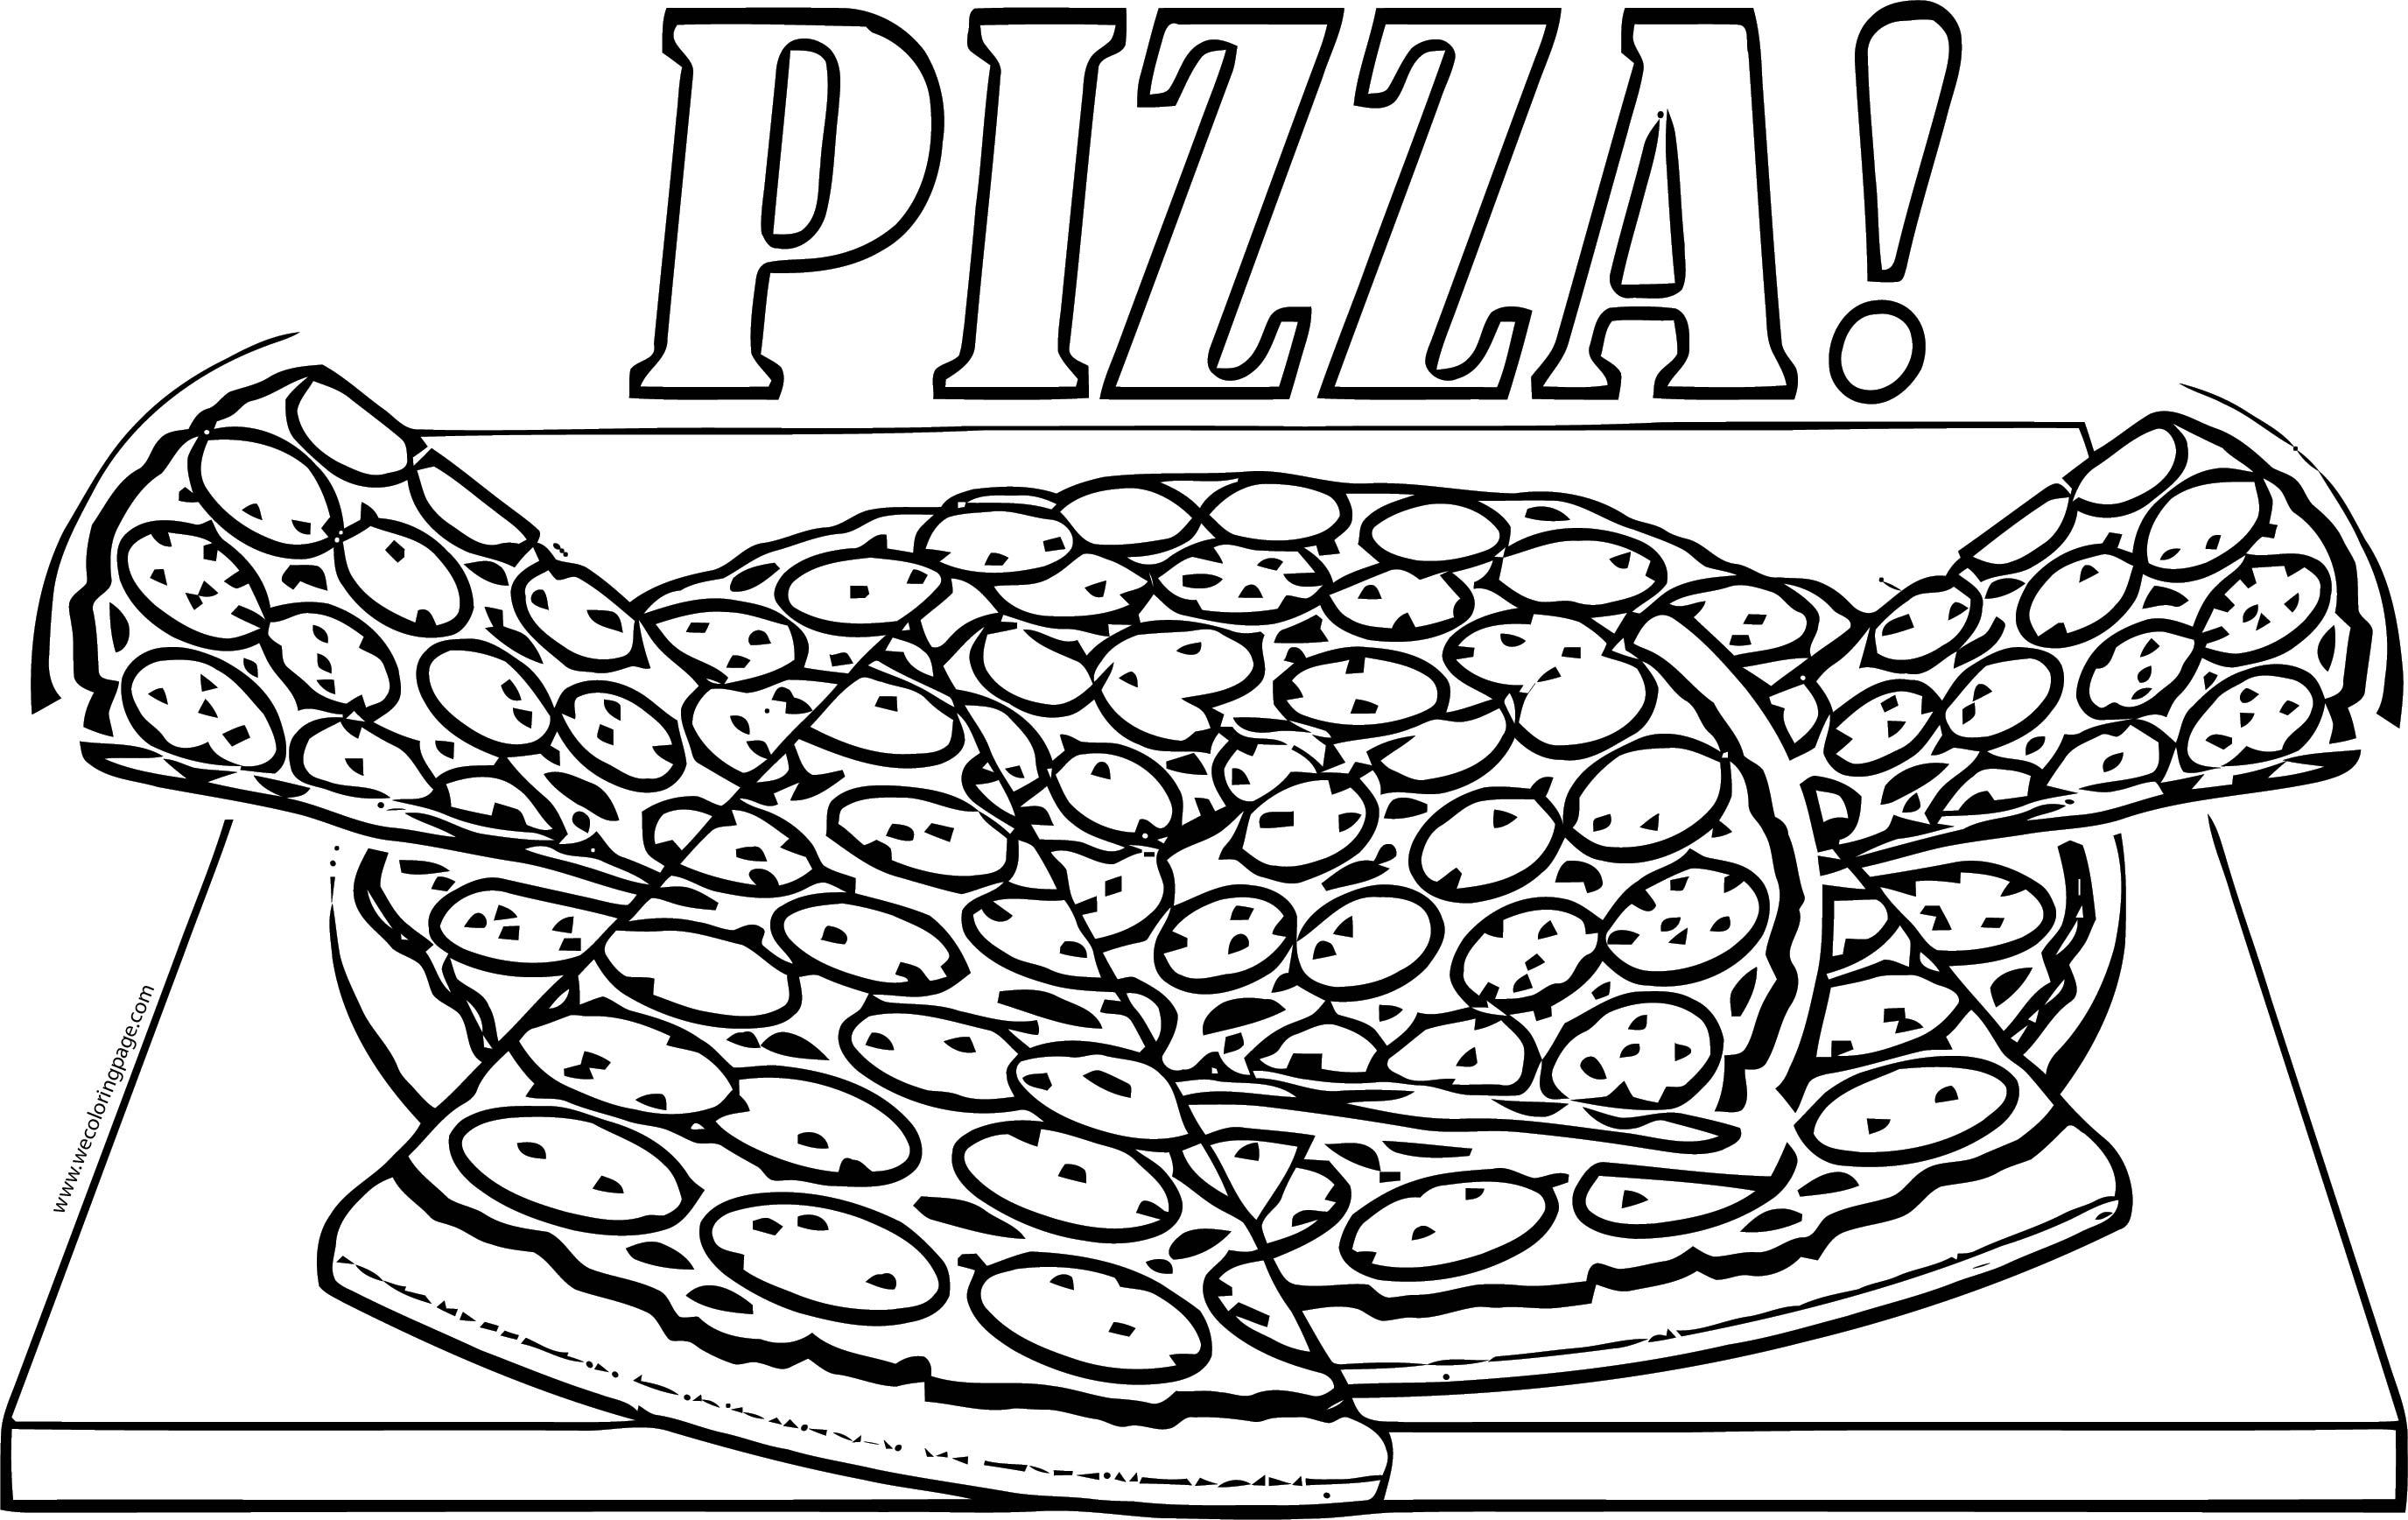 Pizza Box Coloring Page Wecoloringpage